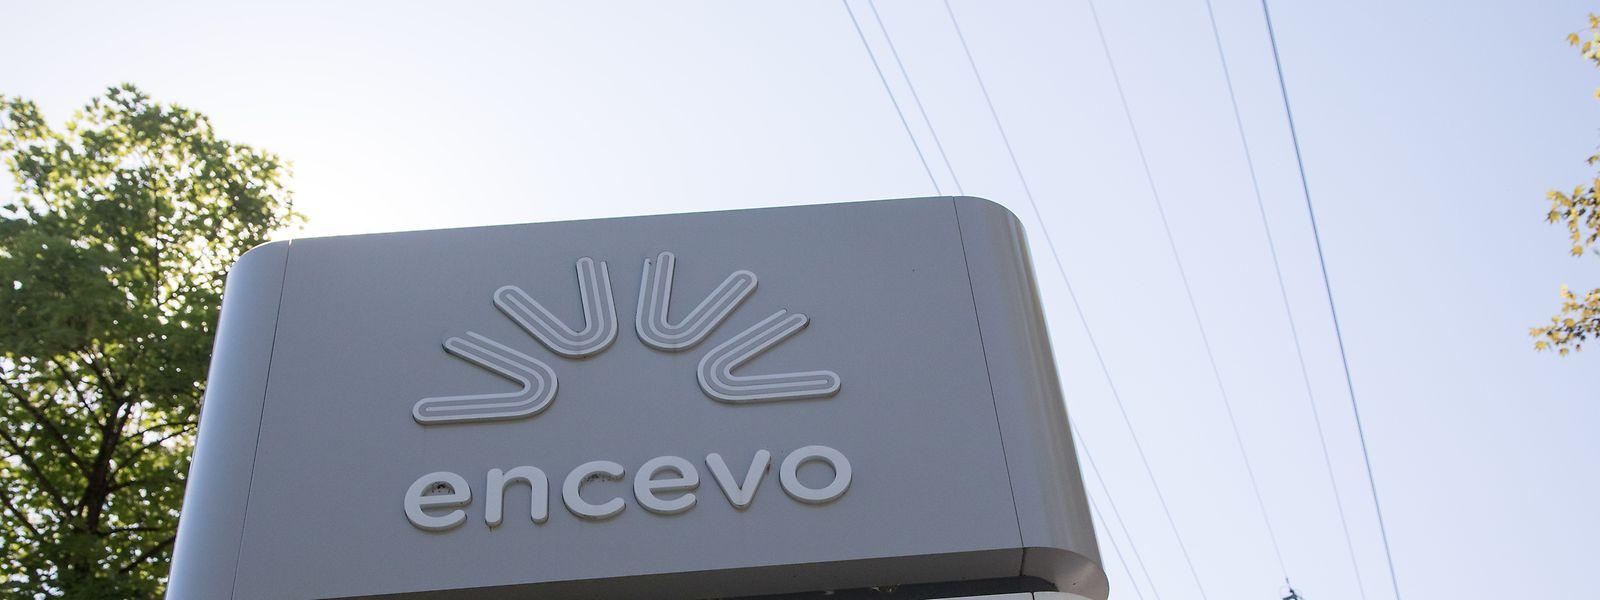 Der Luxemburger Energieversorger Encevo.